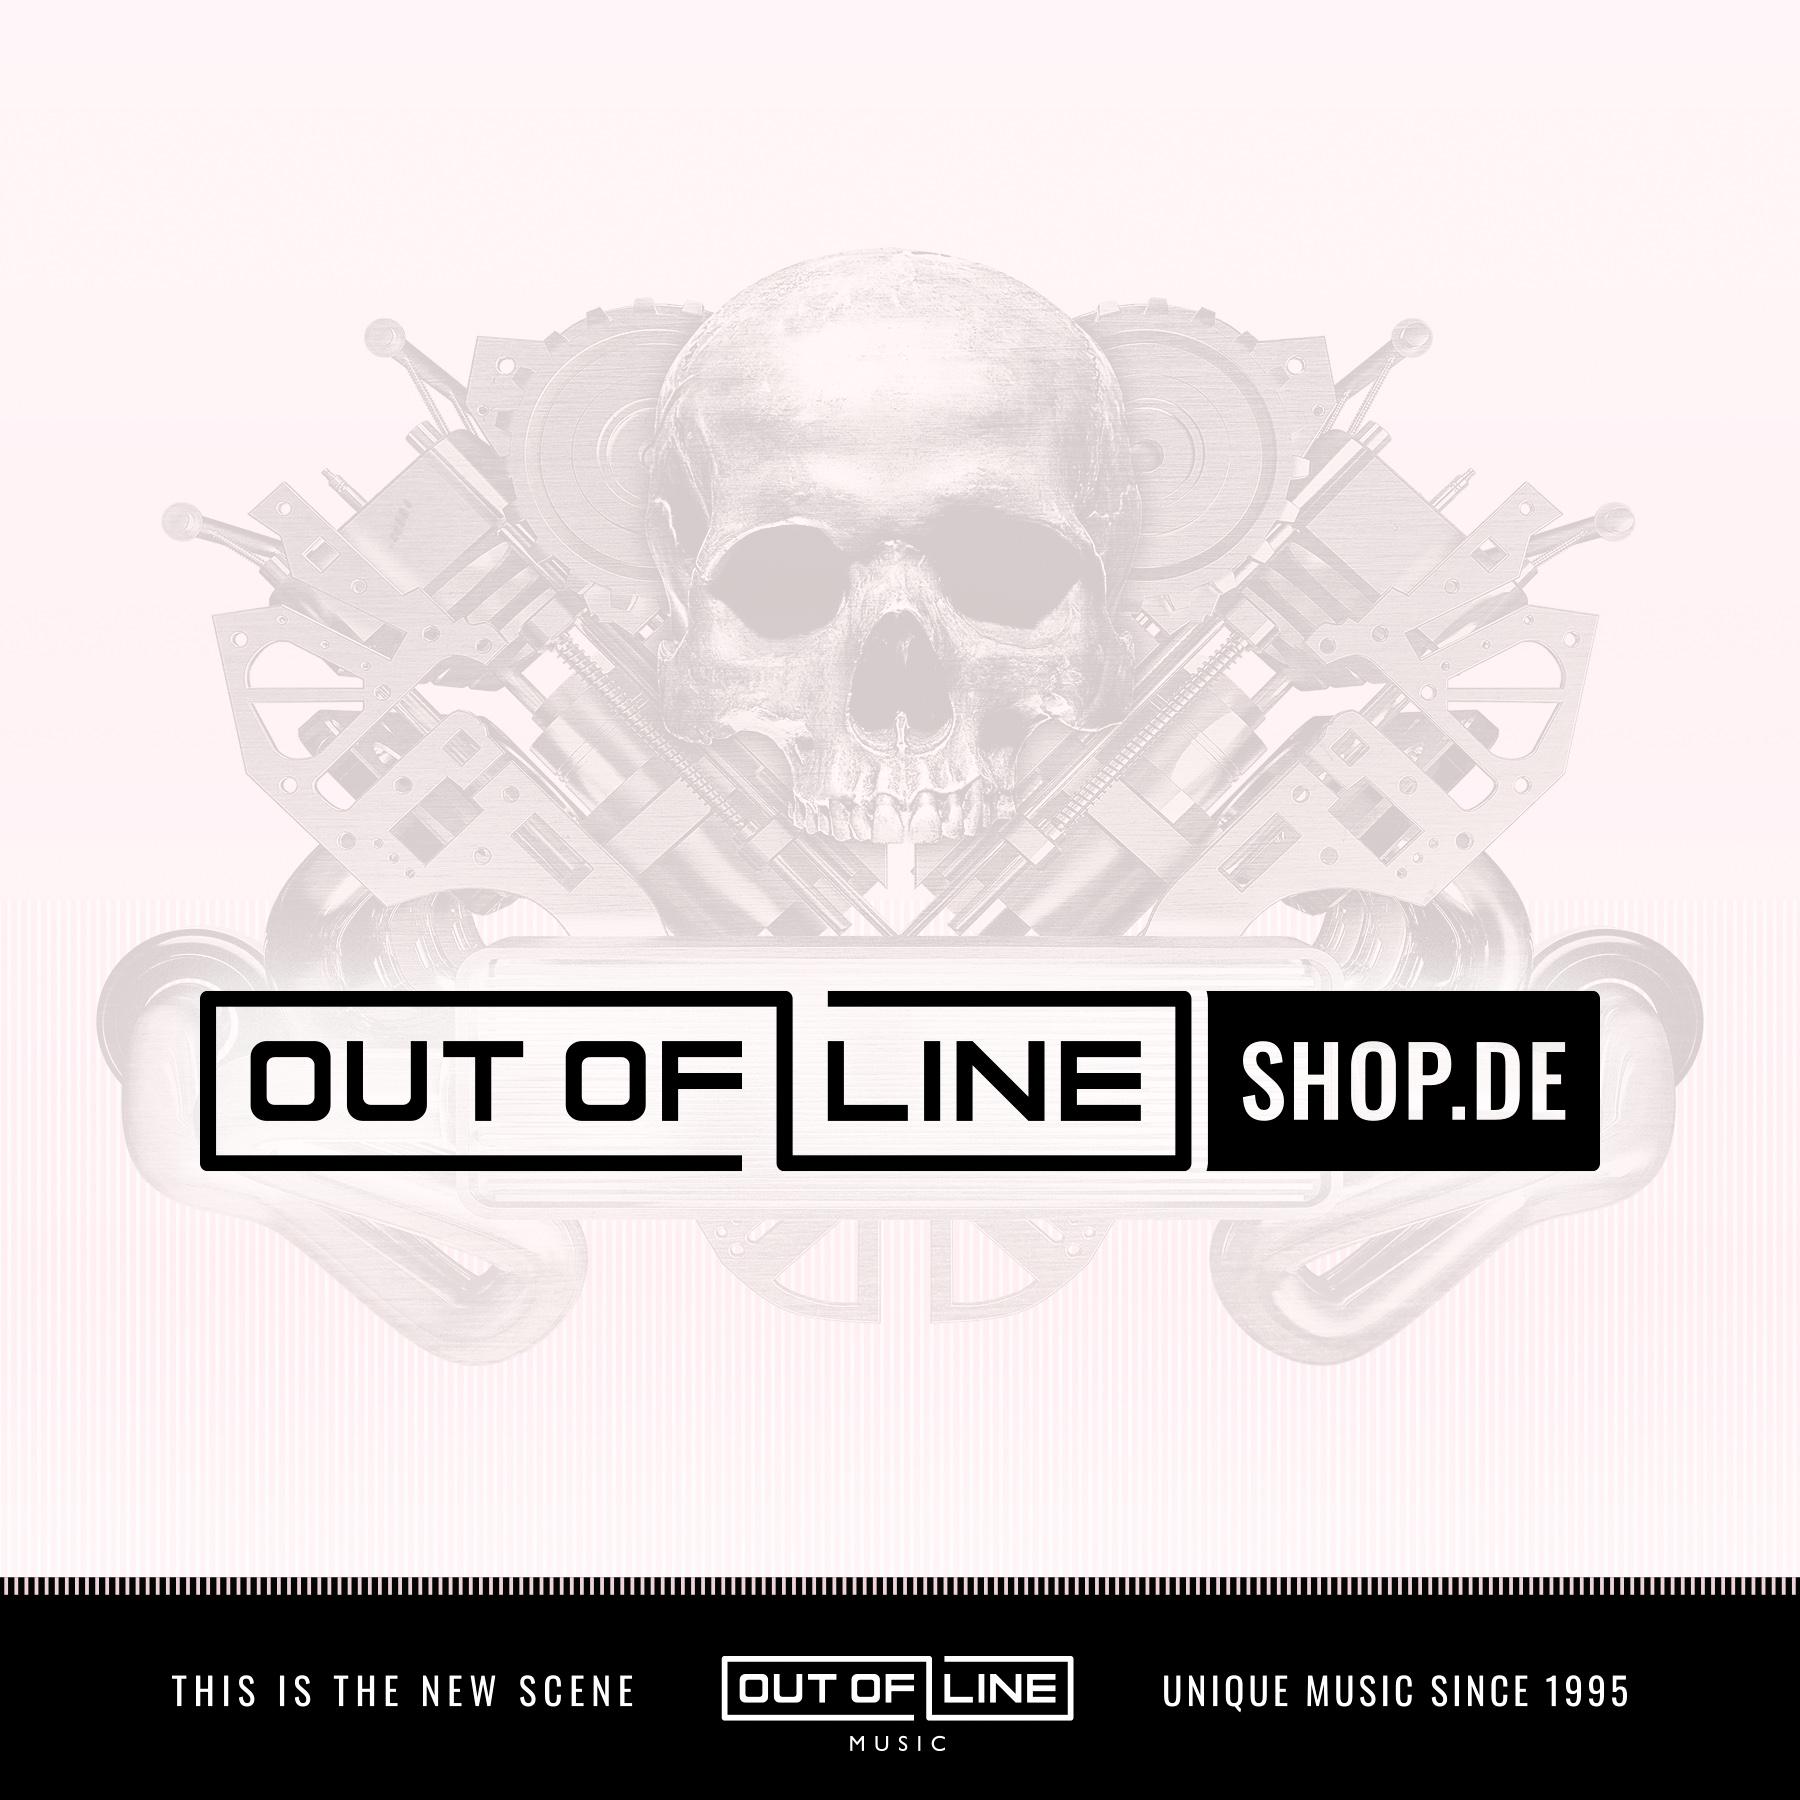 Jäger 90 - Fleisch macht böse - CD - CD Digipak